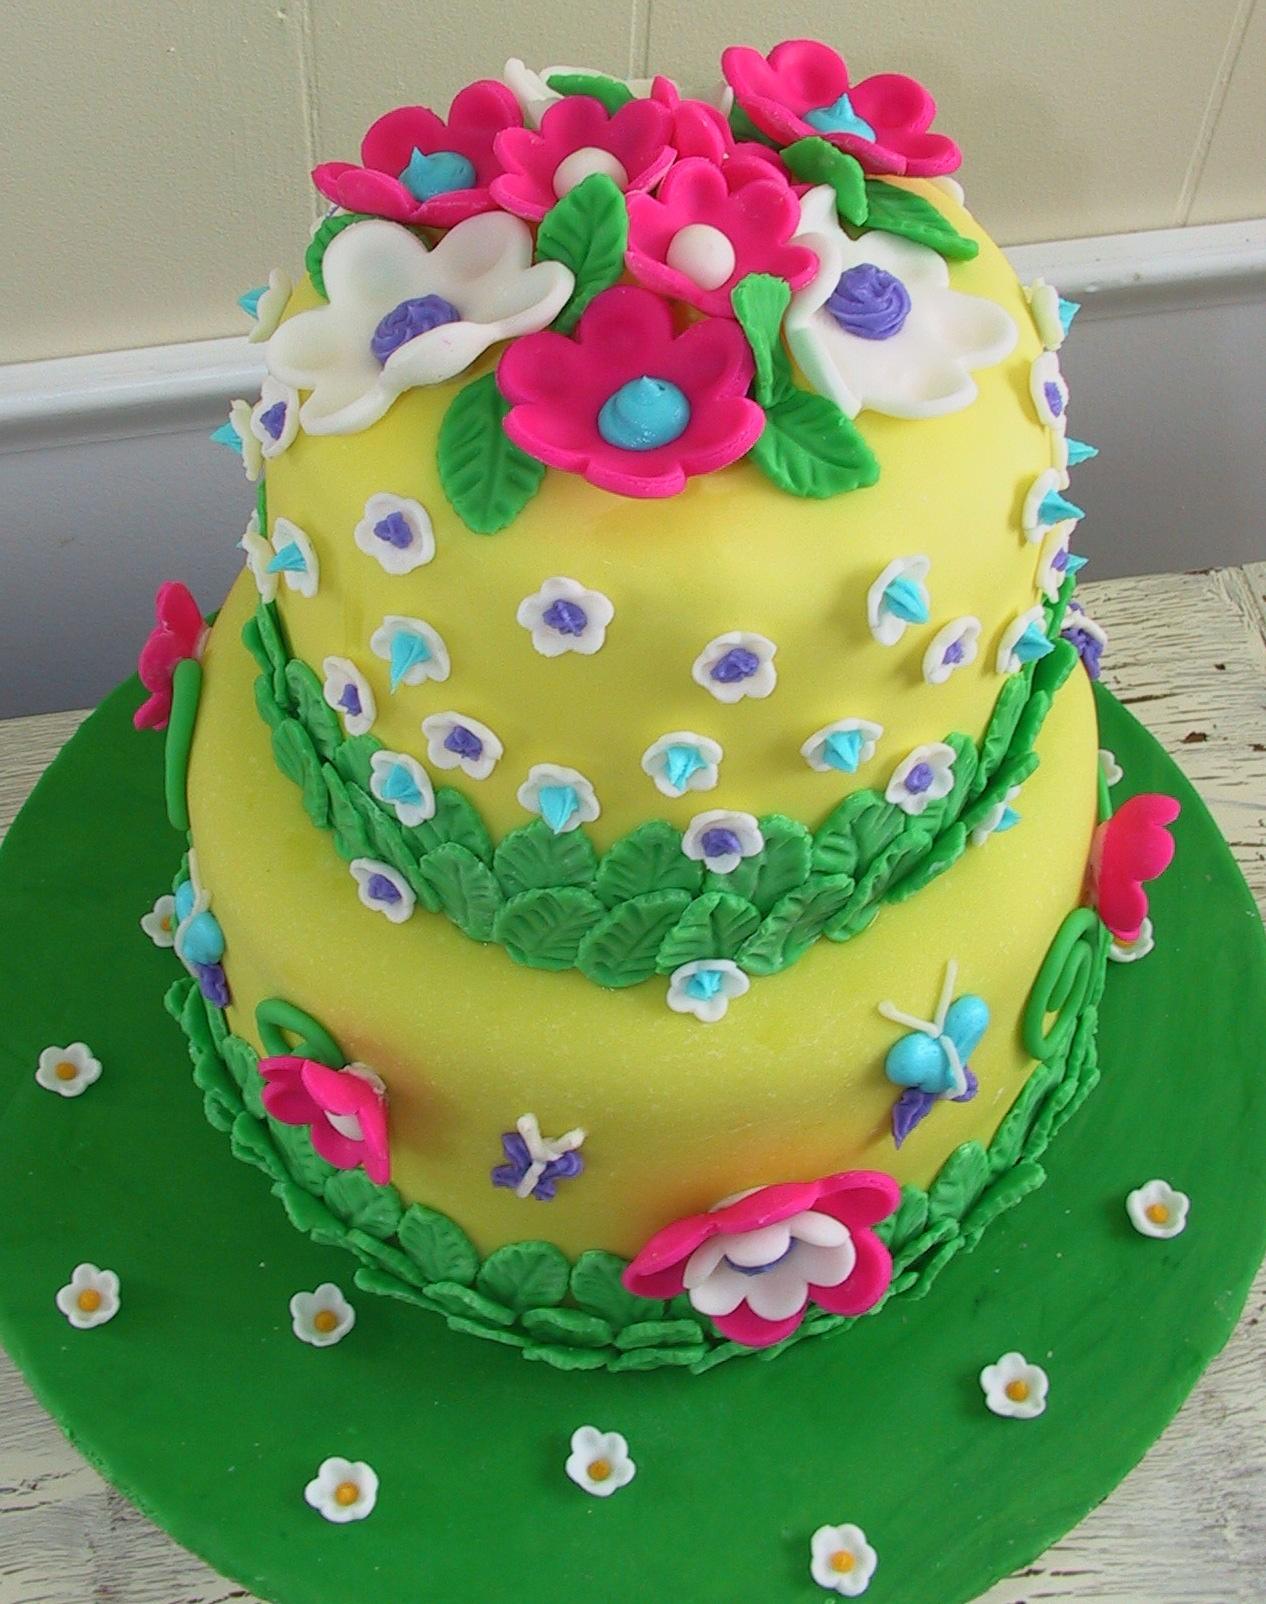 Miraculous Flower Cakes Decoration Ideas Little Birthday Cakes Personalised Birthday Cards Beptaeletsinfo